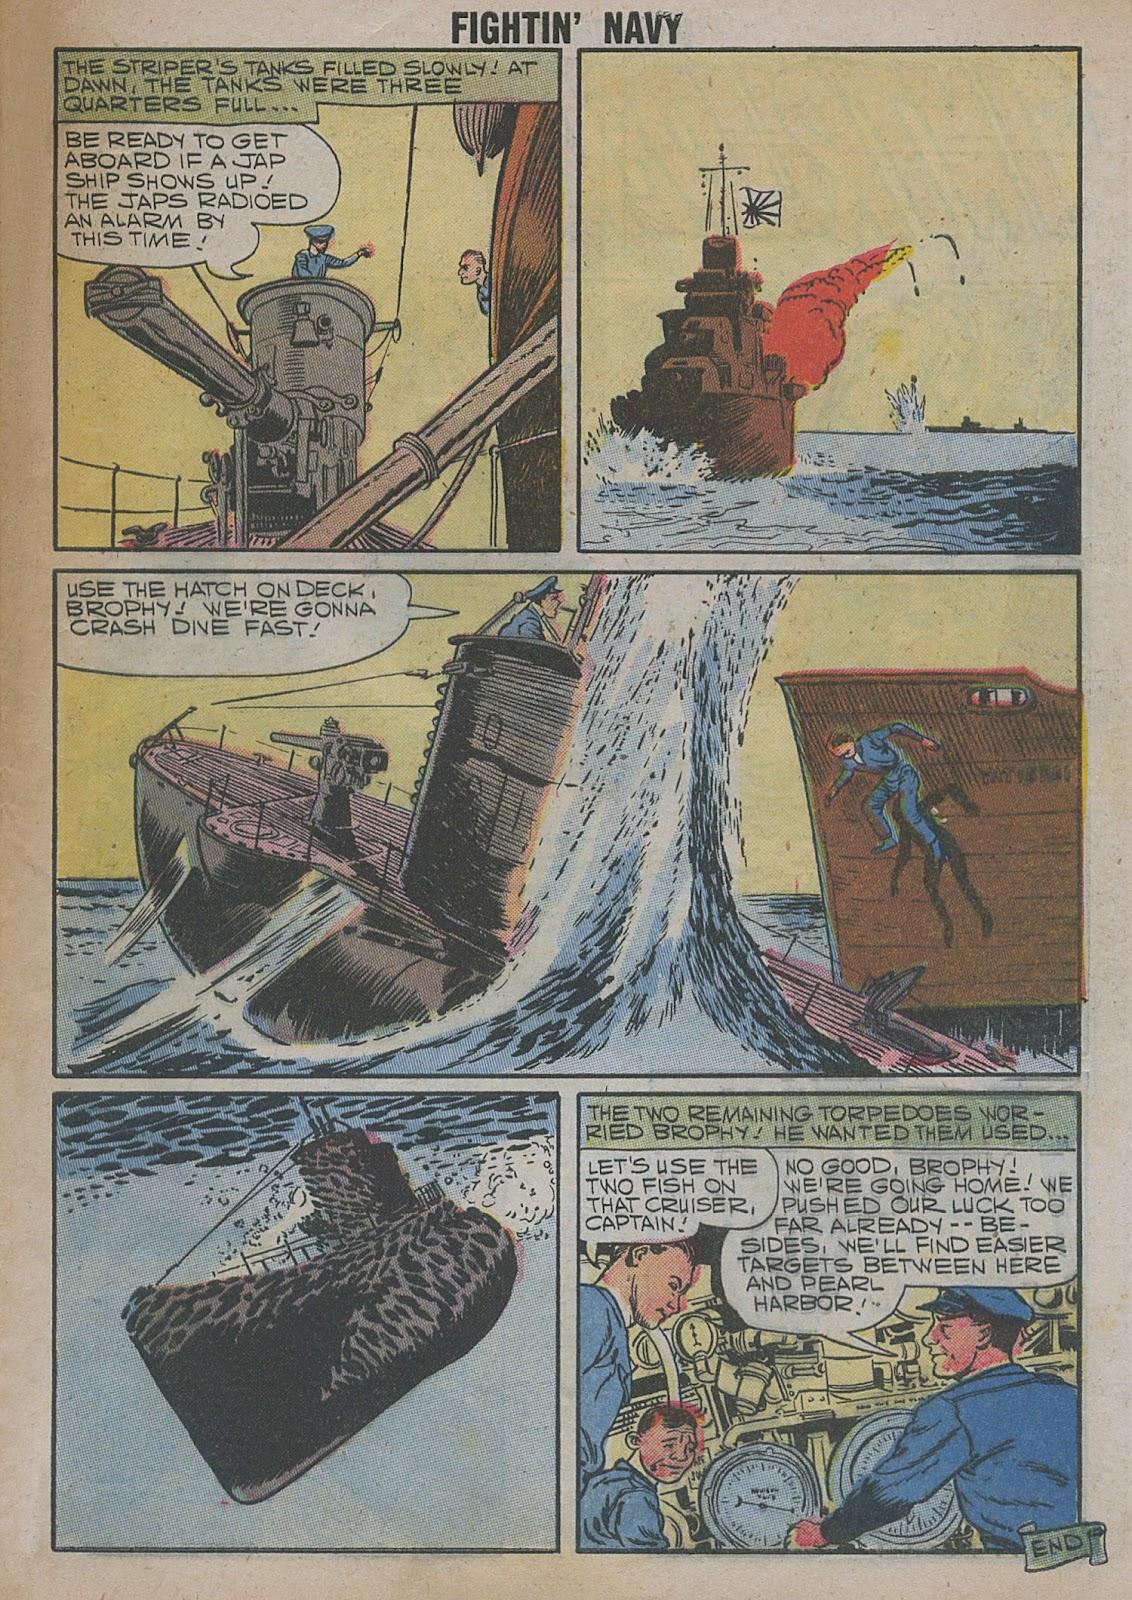 Read online Fightin' Navy comic -  Issue #82 - 7